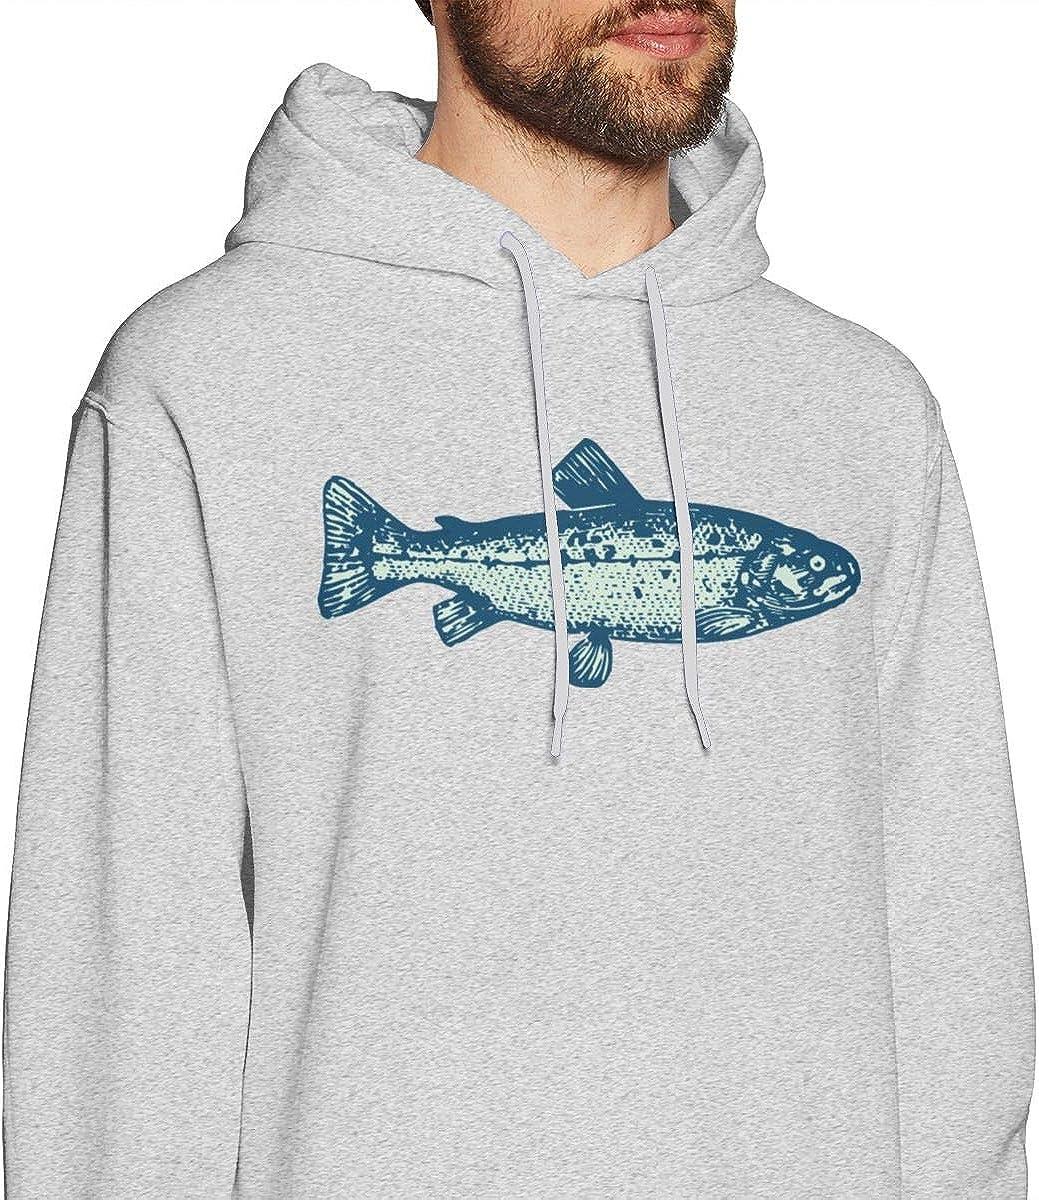 Green Bass Fish Hoodie Sweatshirt Funny Pullover Jacket Male